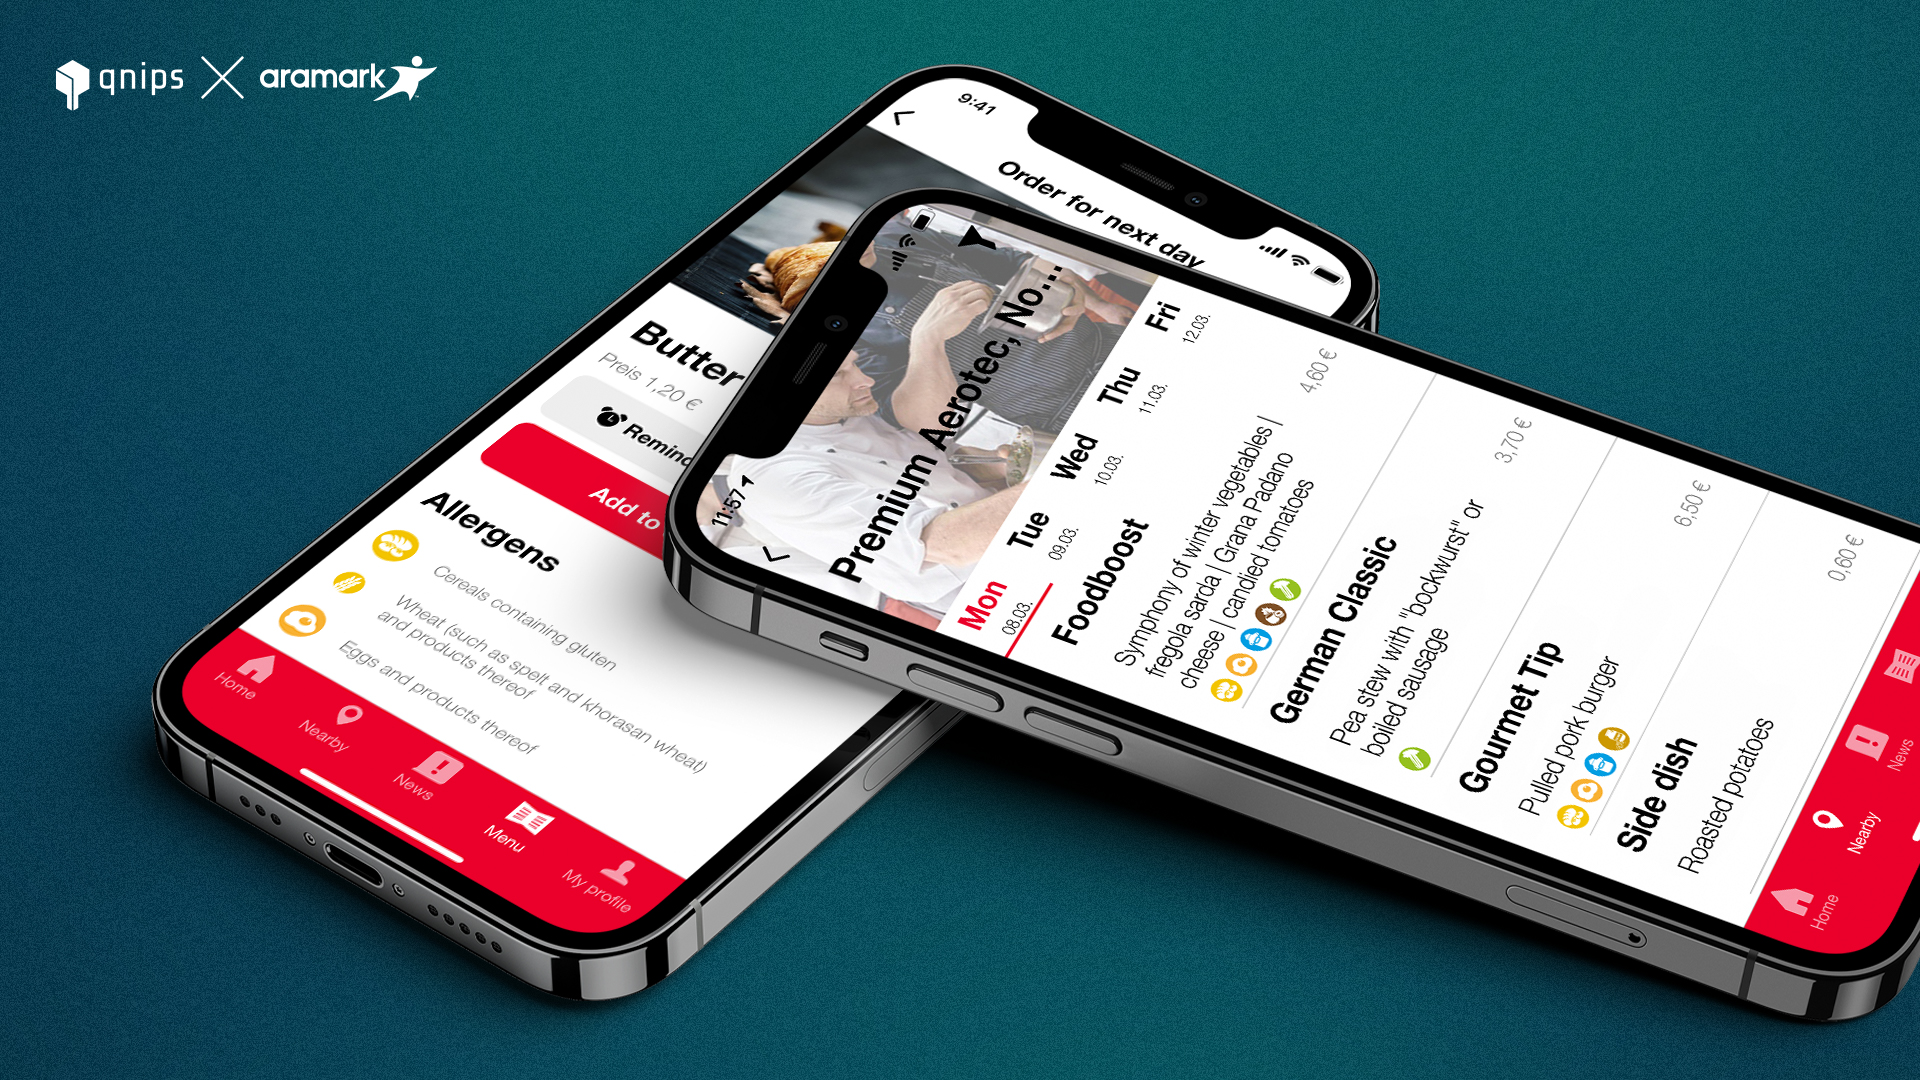 Menu display in the My-Restaurant-App